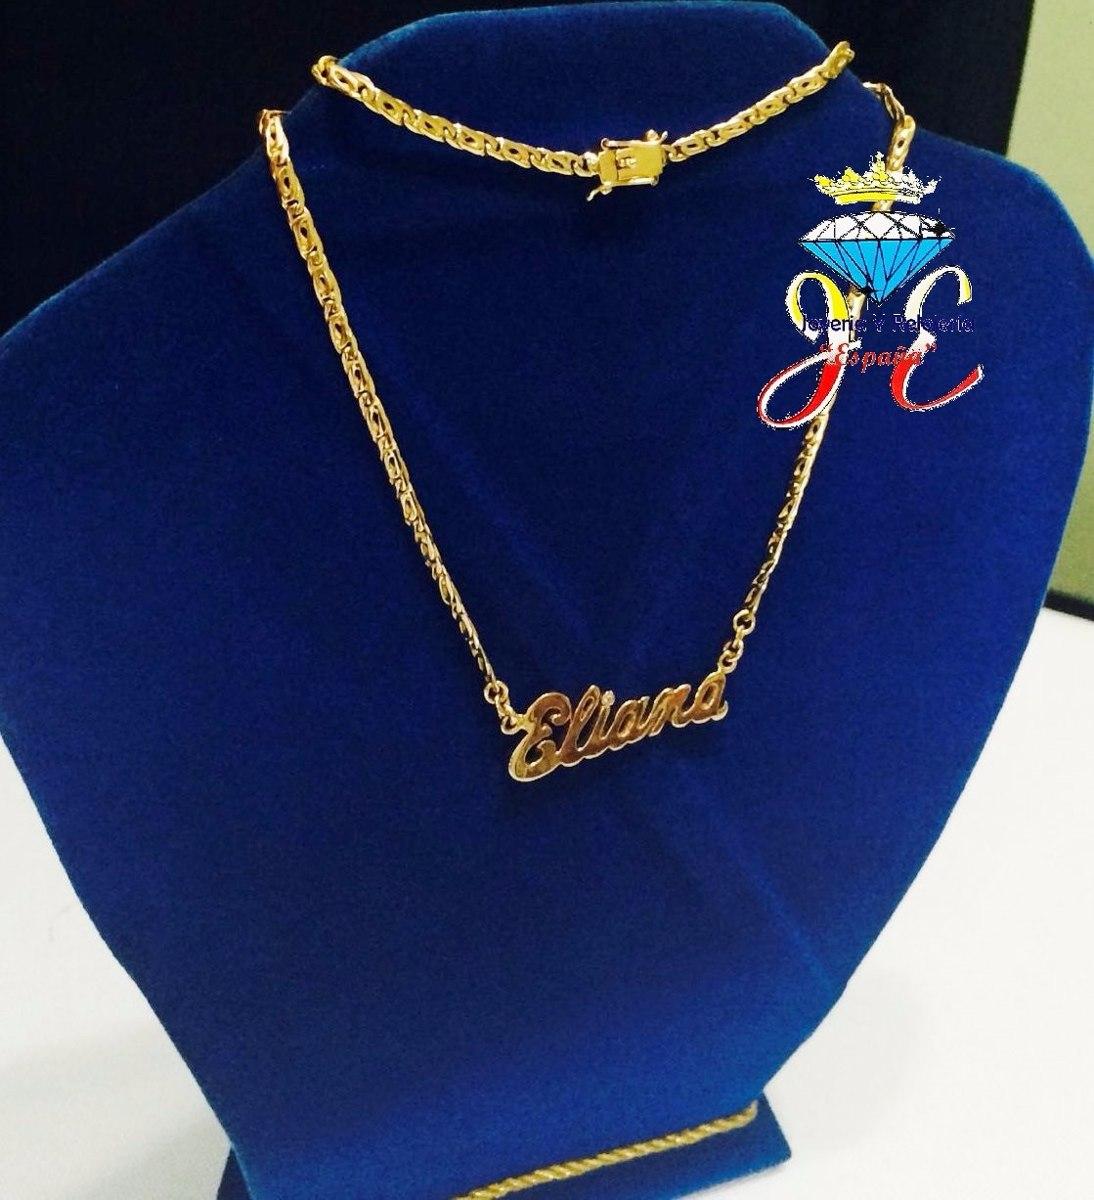 ad08e137d07a cadena de oro 18k mónaco personalizado mujer mod 17 jespaña. Cargando zoom.